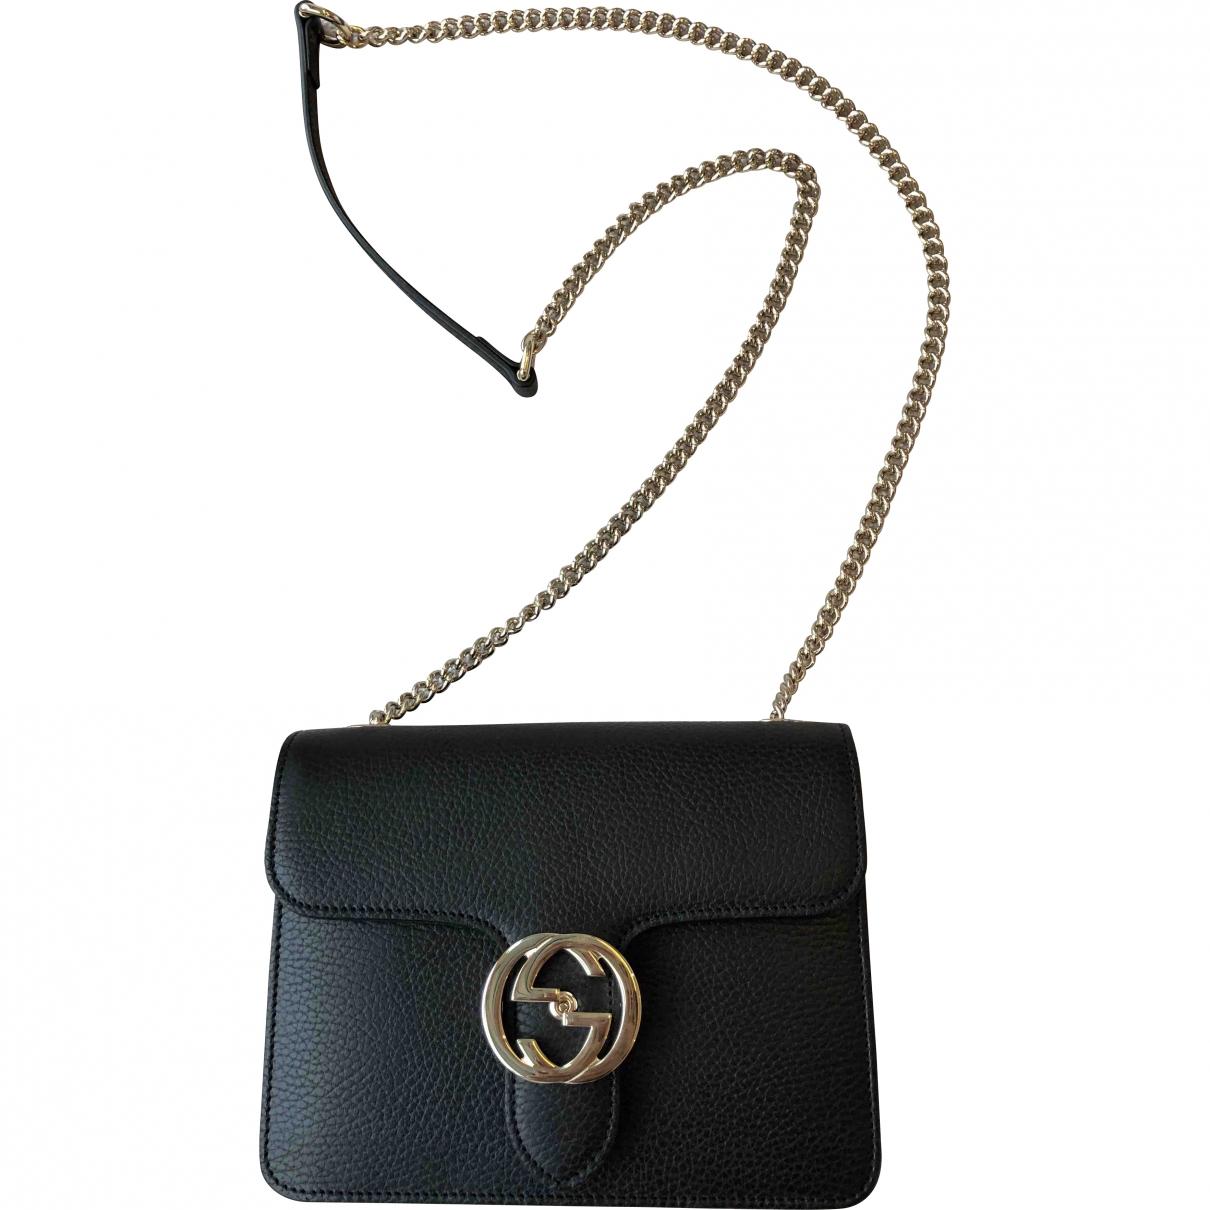 Gucci Interlocking Black Leather handbag for Women N